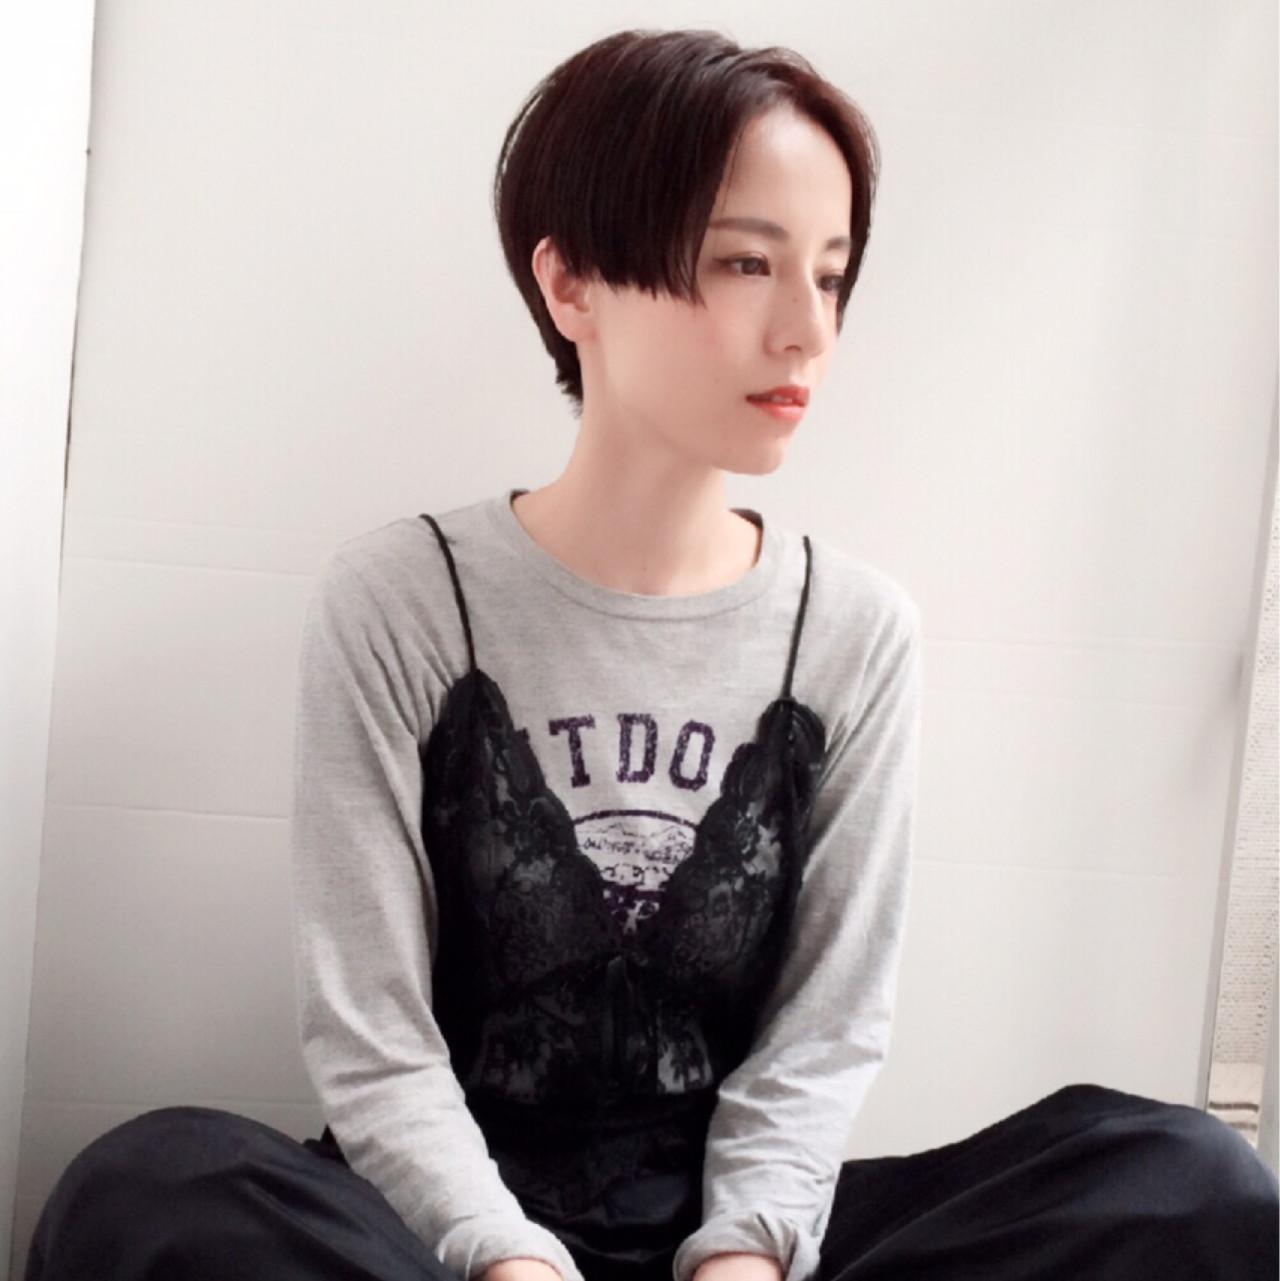 https://hair.cm/stylist-1430/